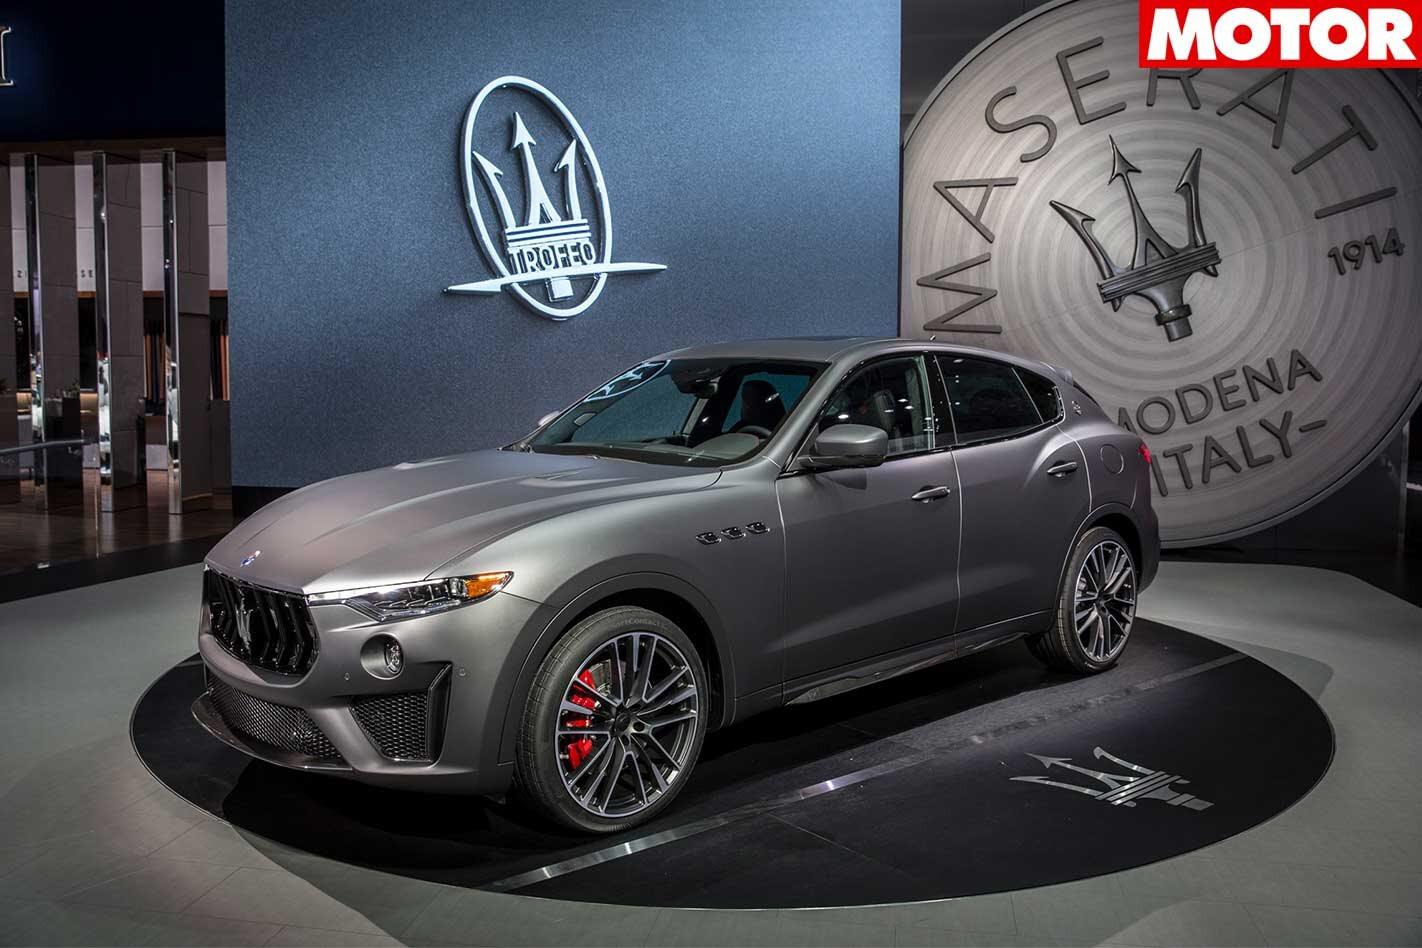 New York 2018 Maserati Levante Trofeo revealed